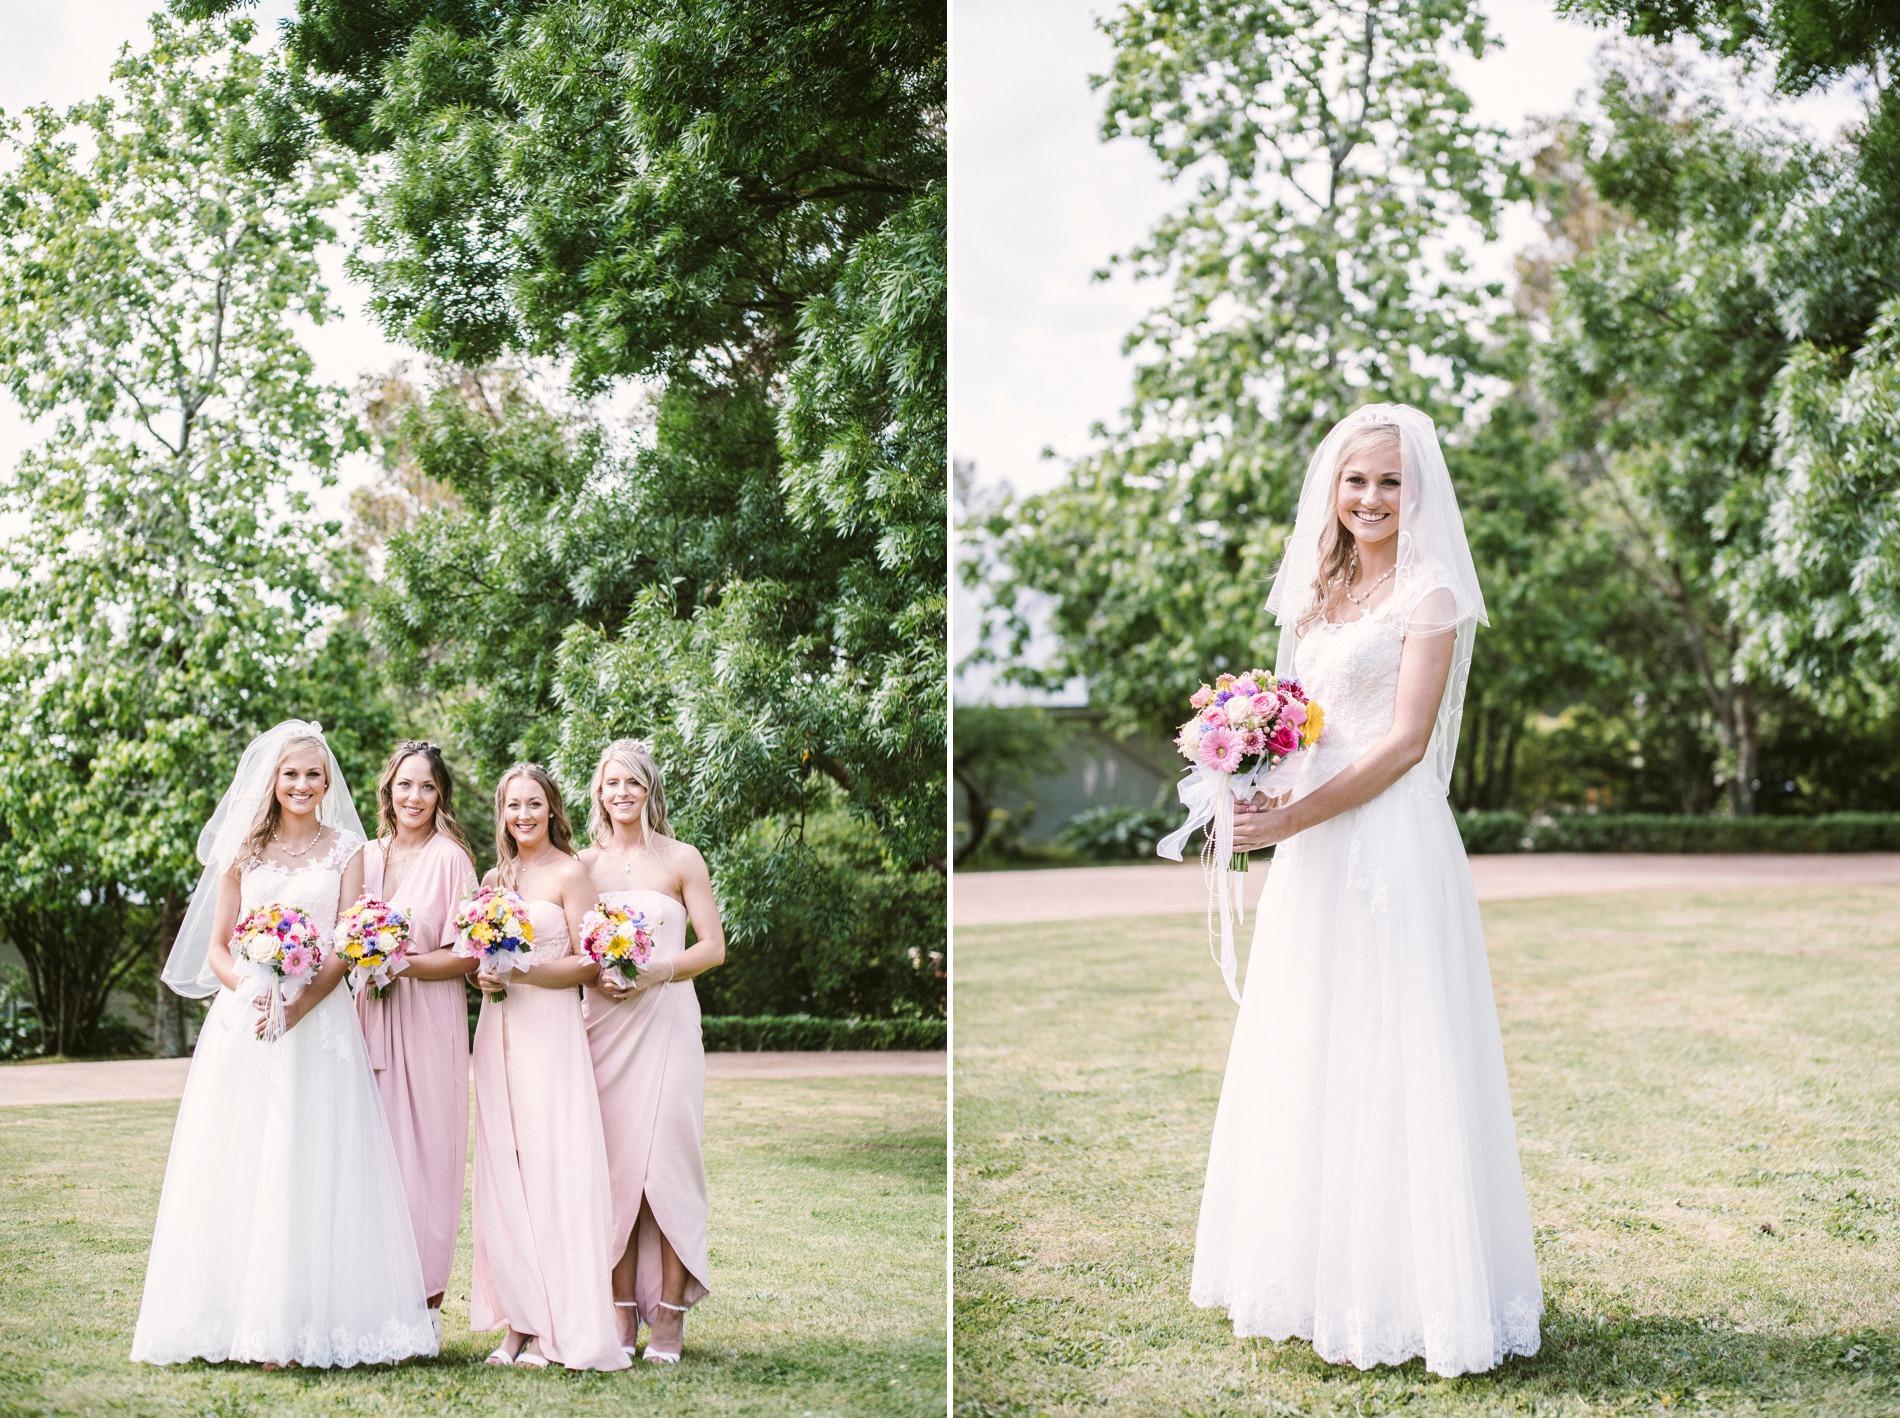 michael-sarah-bramleigh-wedding-photography-kyle-larson